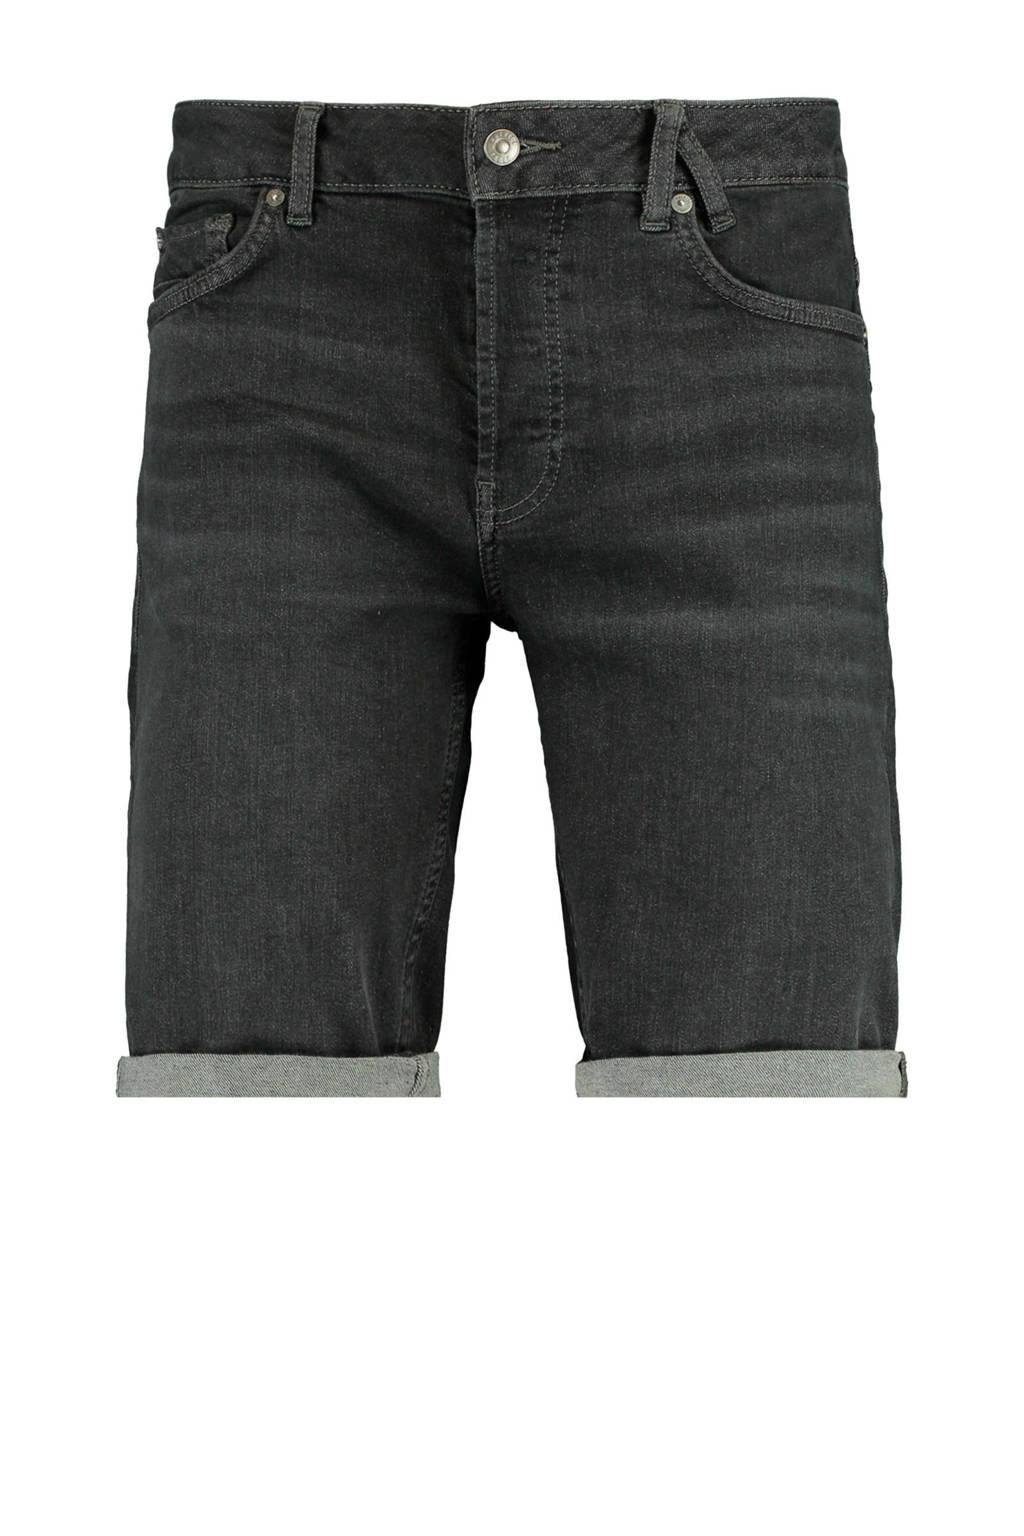 America Today regular fit jeans short washed black